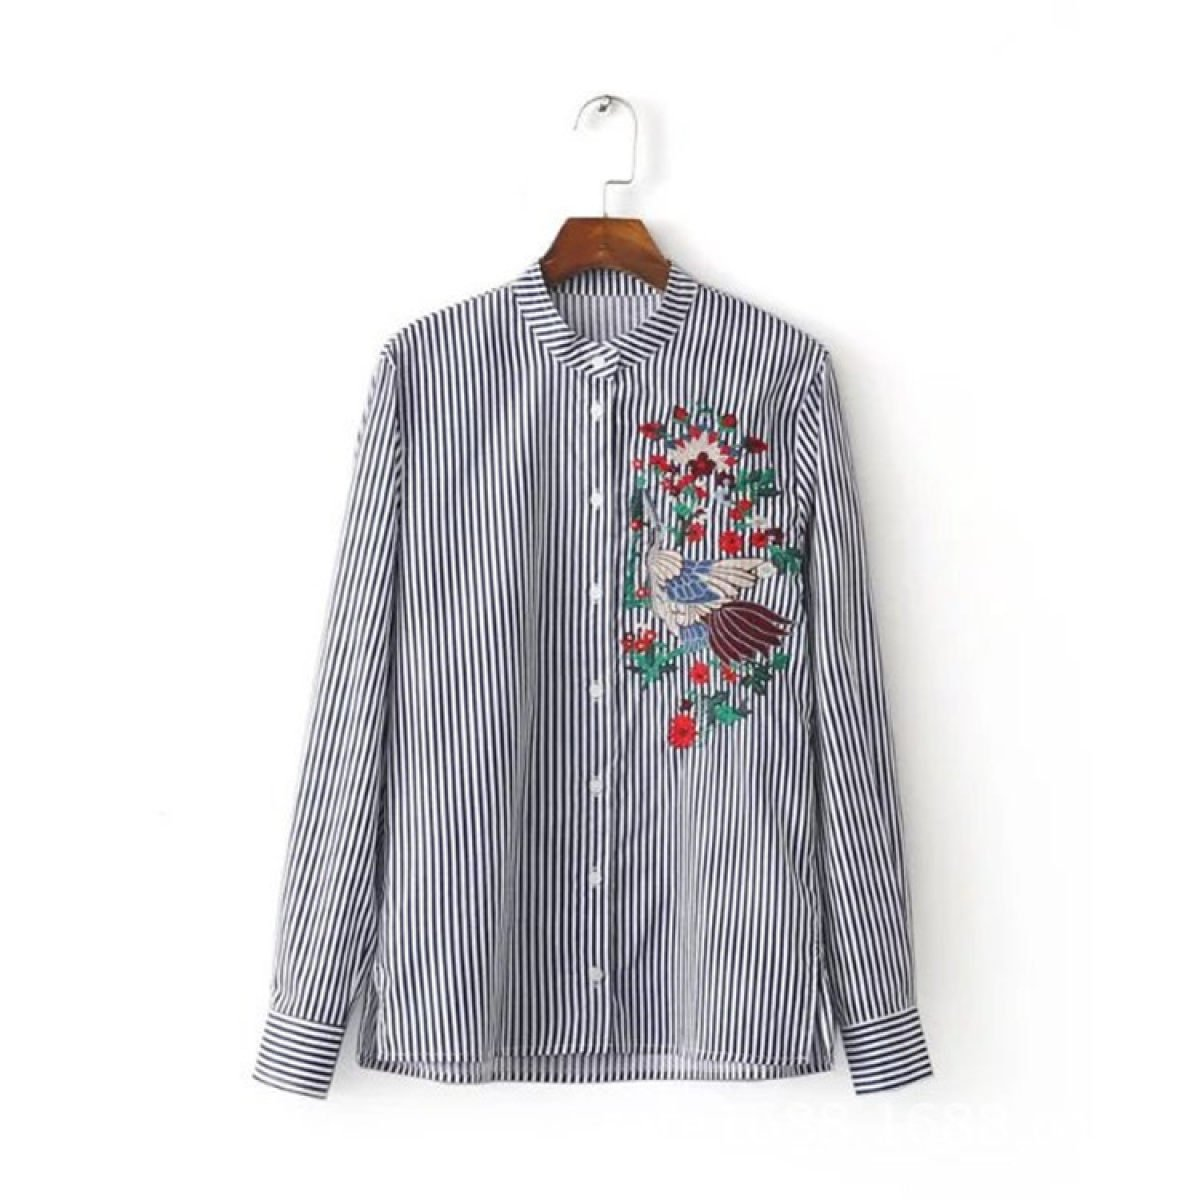 LQABW Mujer Otoño Nueva Blusa Azul Y Blanco Rayas Bordado Stand Collar Camisa De Manga Larga